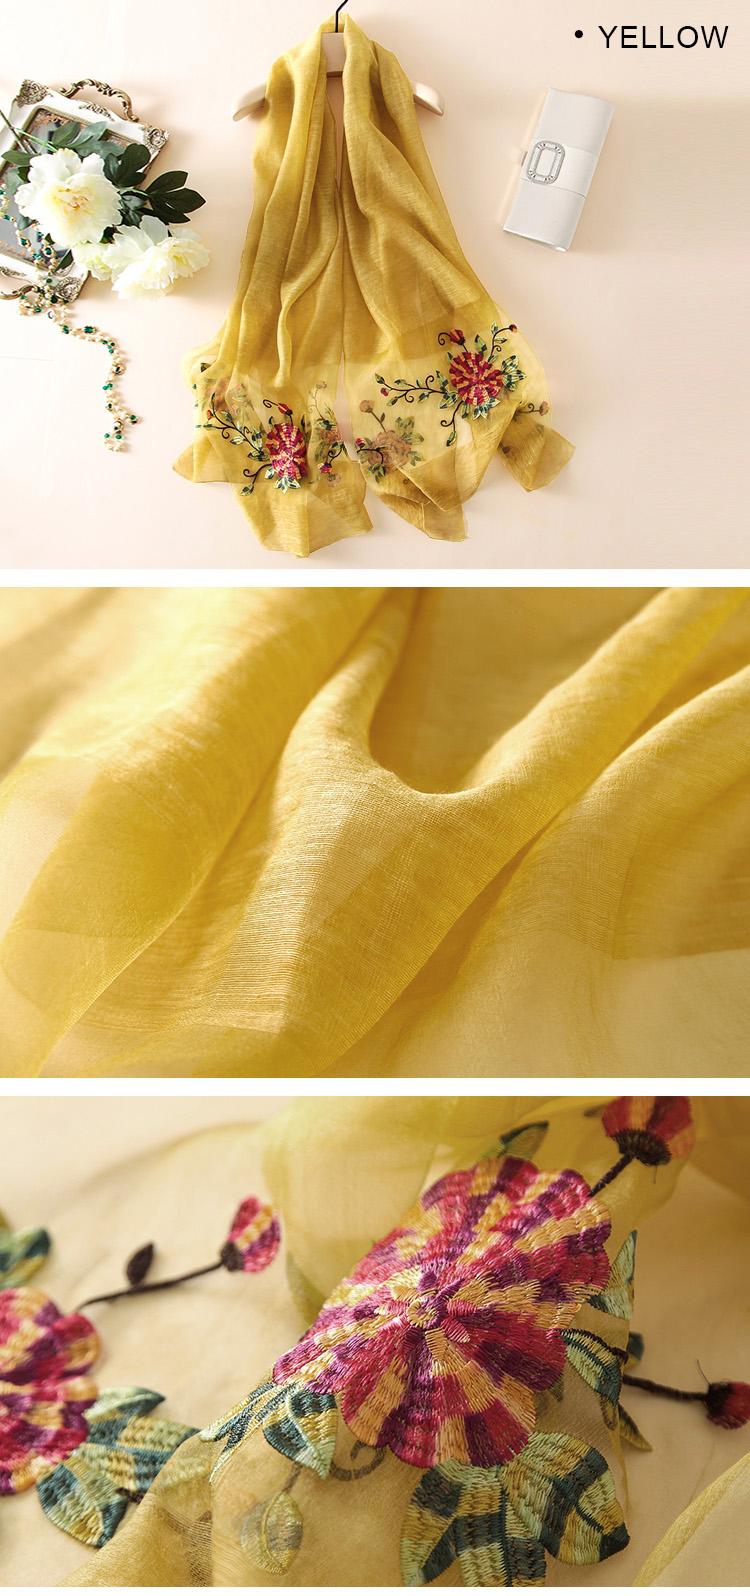 PTAH Winter Women Accessories Wool Silk Shawl Pashmina Oversize Scarf Femme luxury Brand Hijab Scarves Tippet Muffler 4PT505